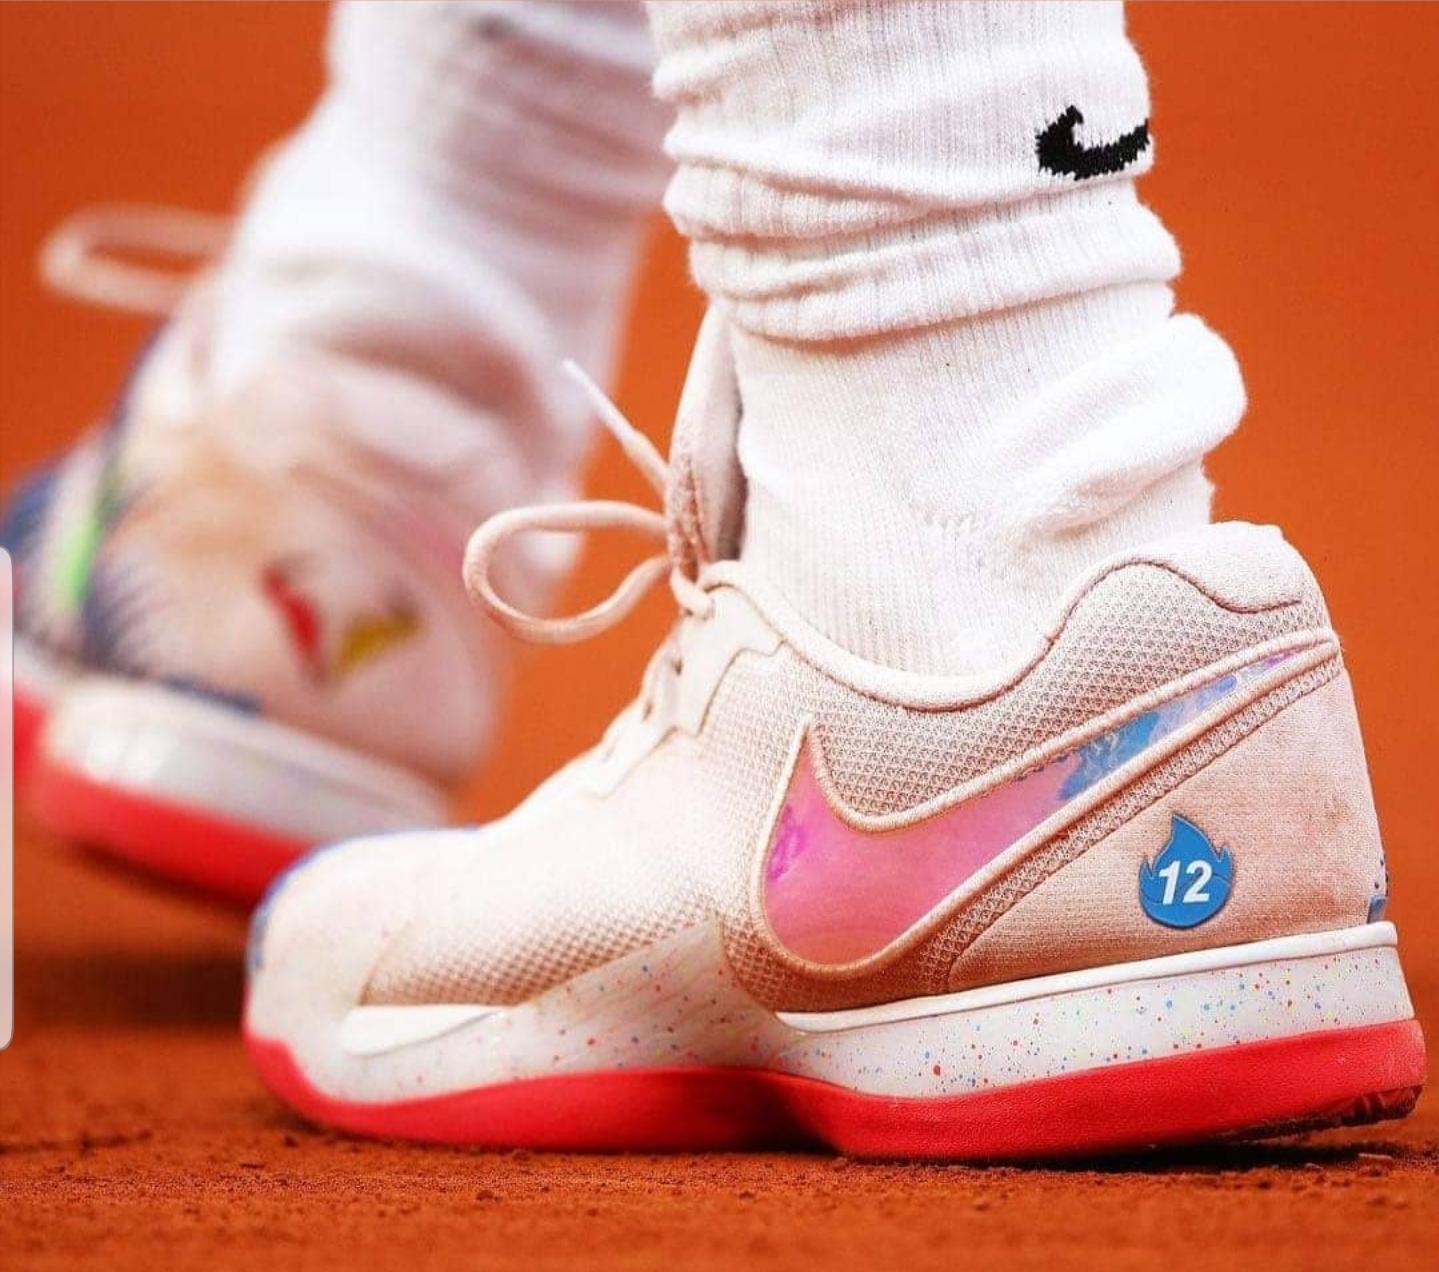 Rafael Nadal Roland Garros Gear 2020 Love Tennis Blog